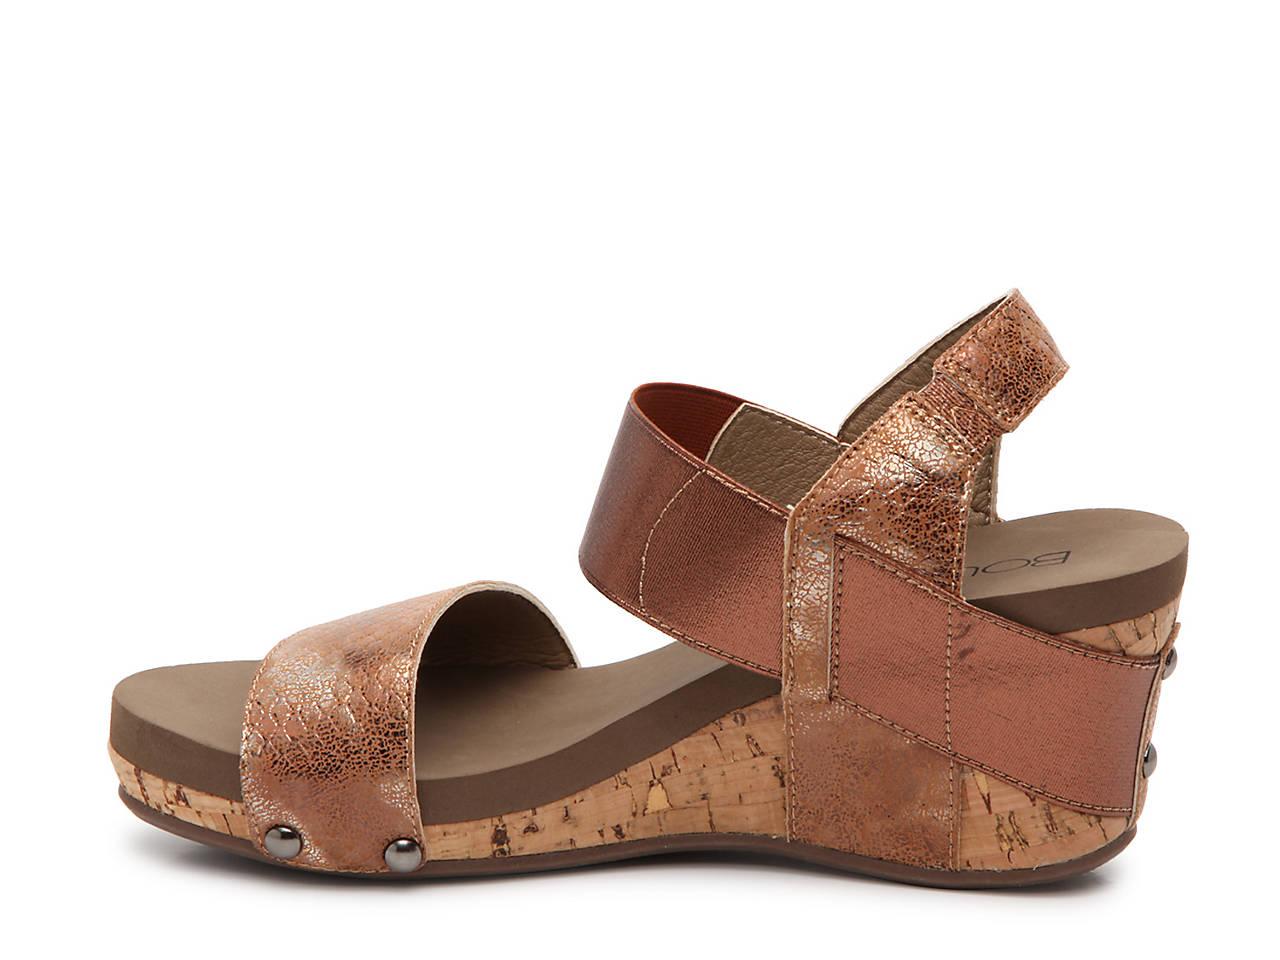 2fc662a6503f Boutique by Corkys Bandit Wedge Sandal Women s Shoes